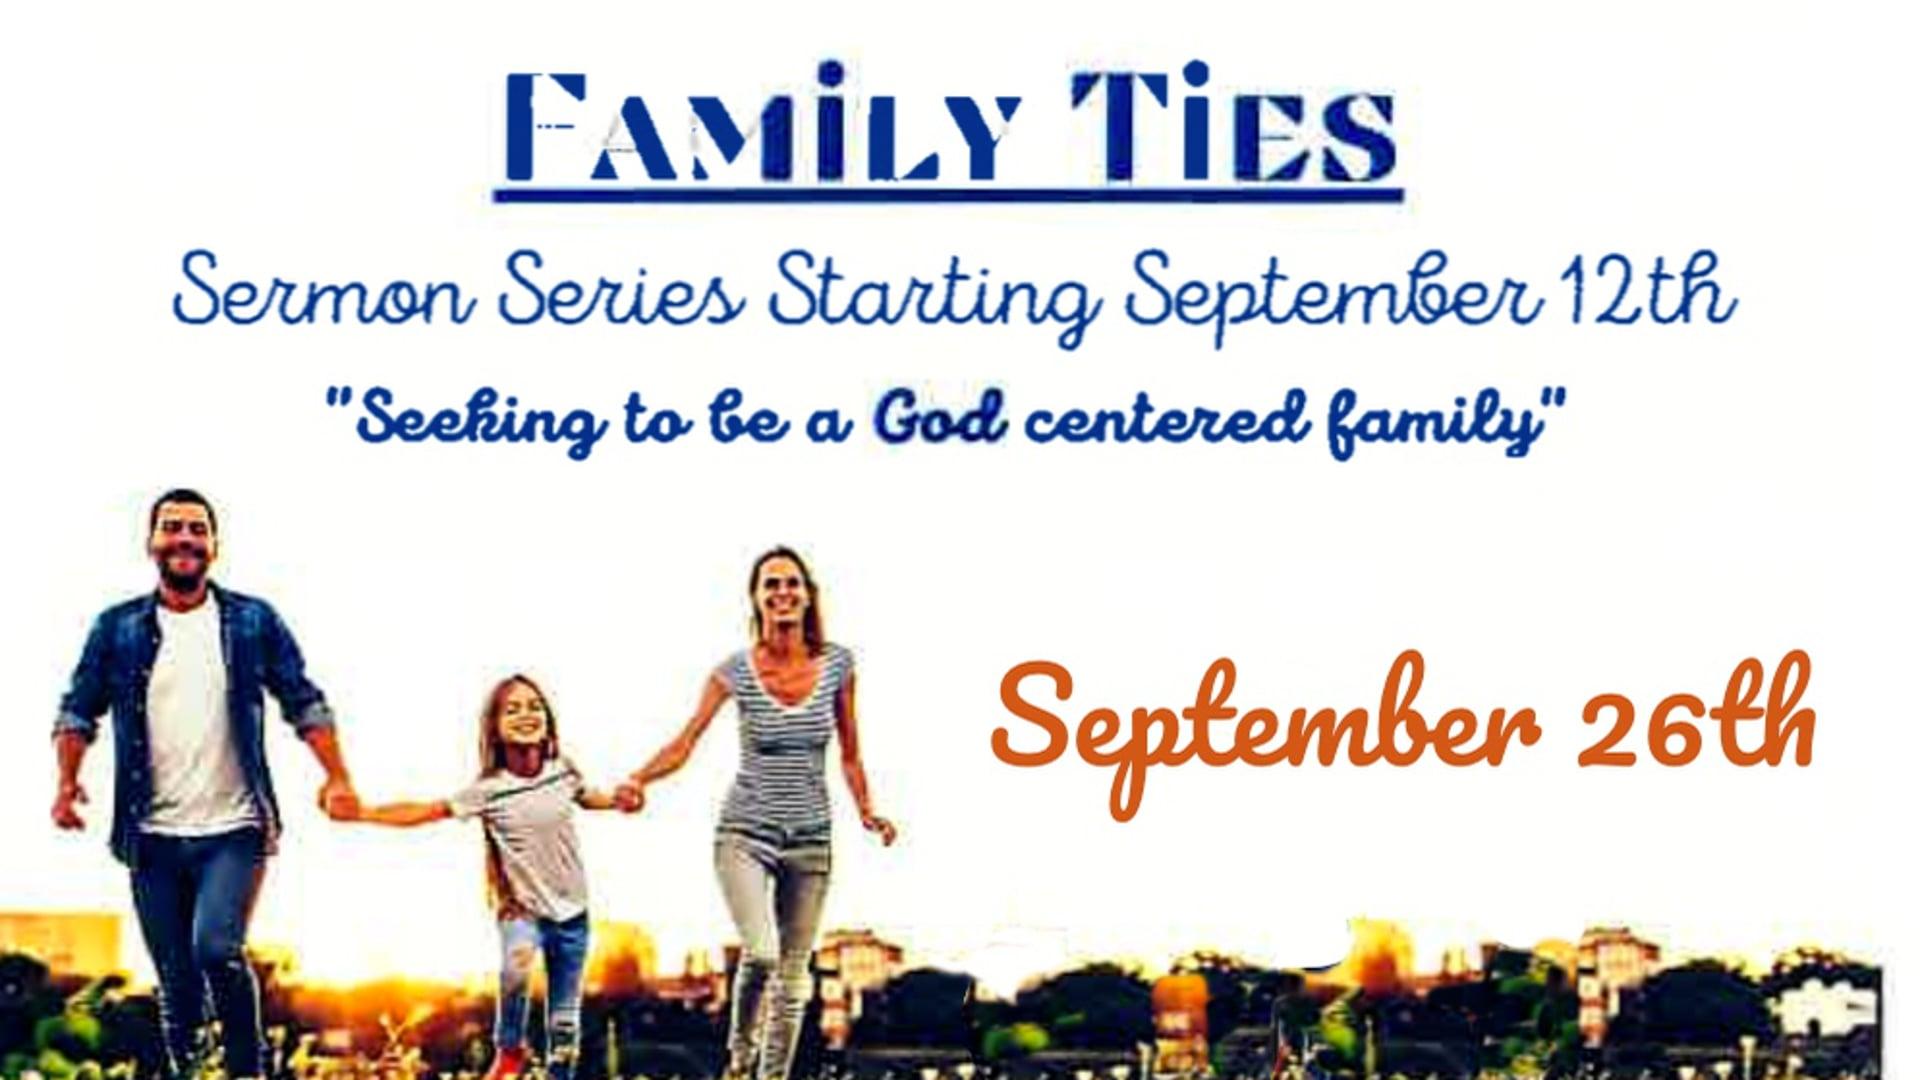 Royston Baptist Church 11 AM Worship Service Message for Sept. 26, 2021